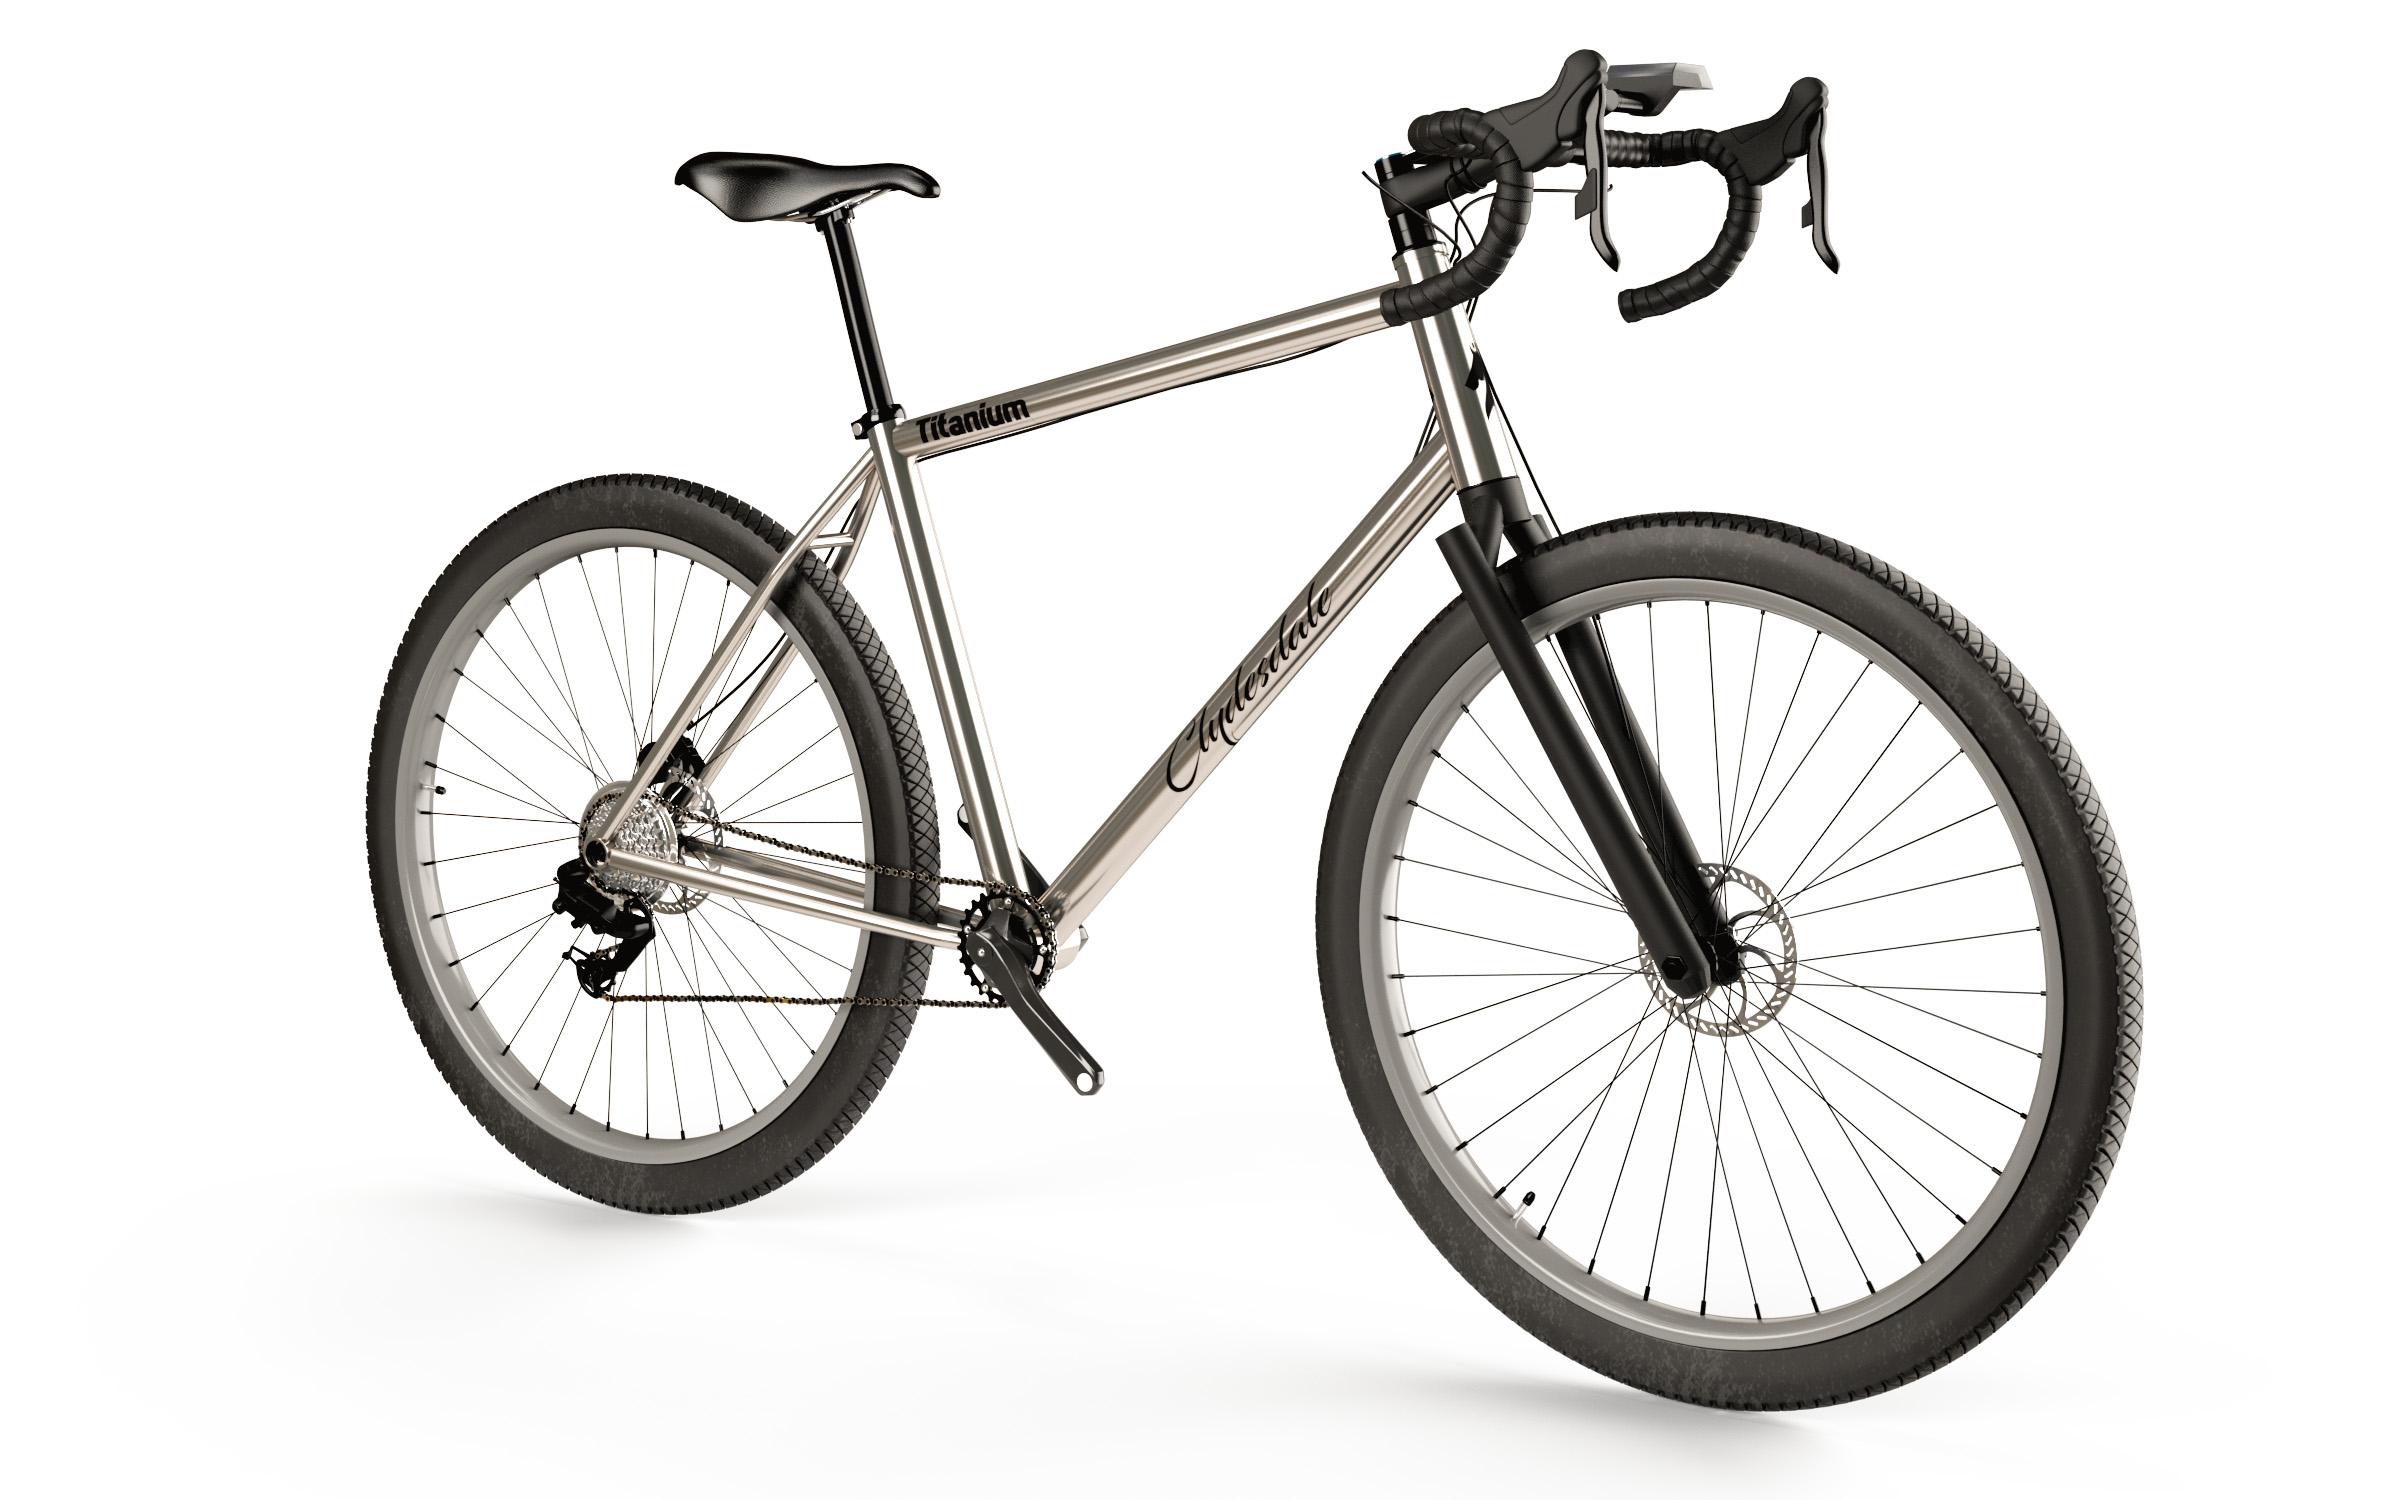 32 inch wheel bike